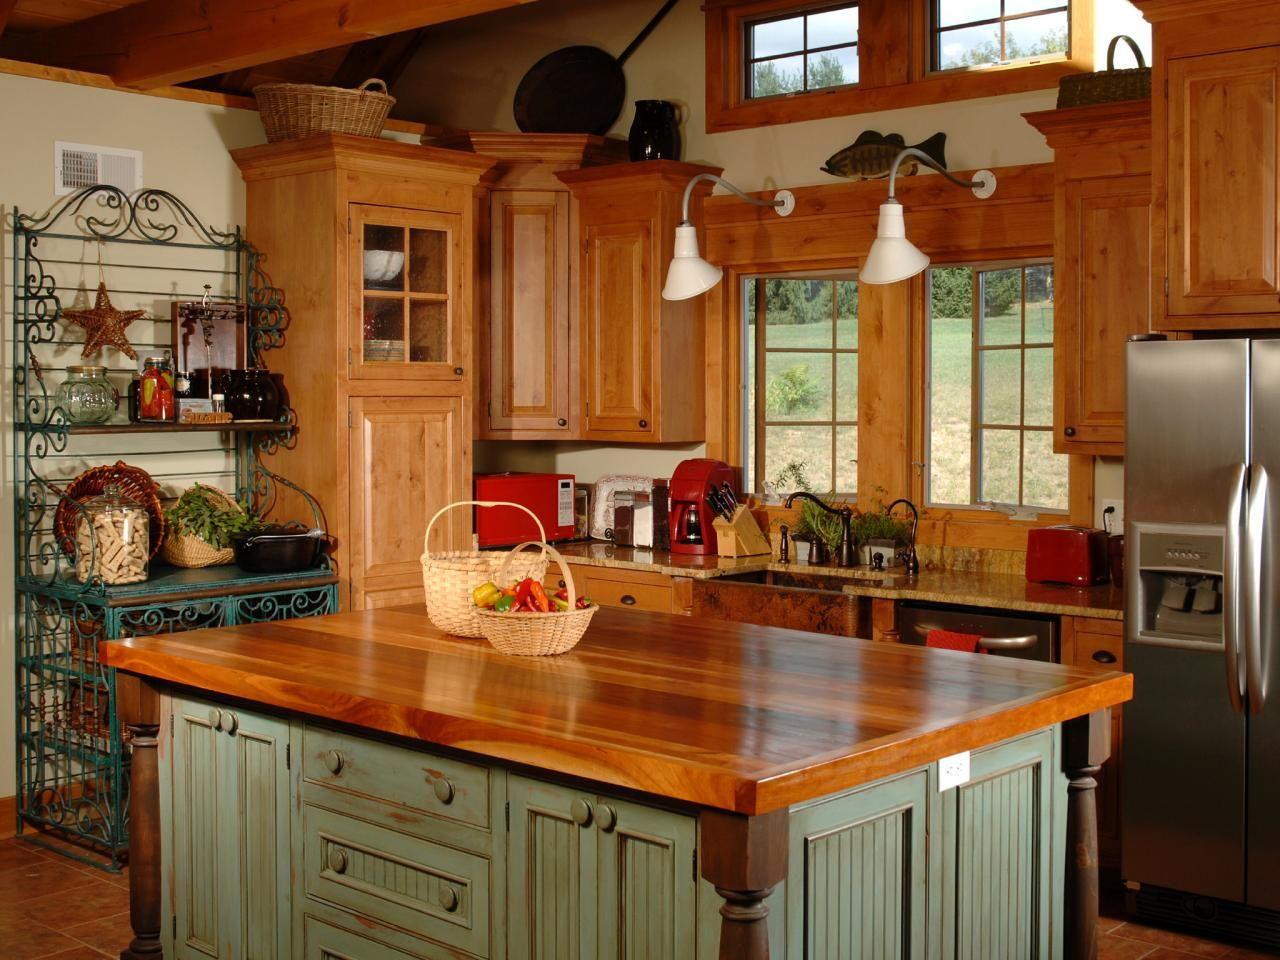 Island Kitchen Designs Layouts Kitchen Islands Beautiful Functional Design Options  Hgtv